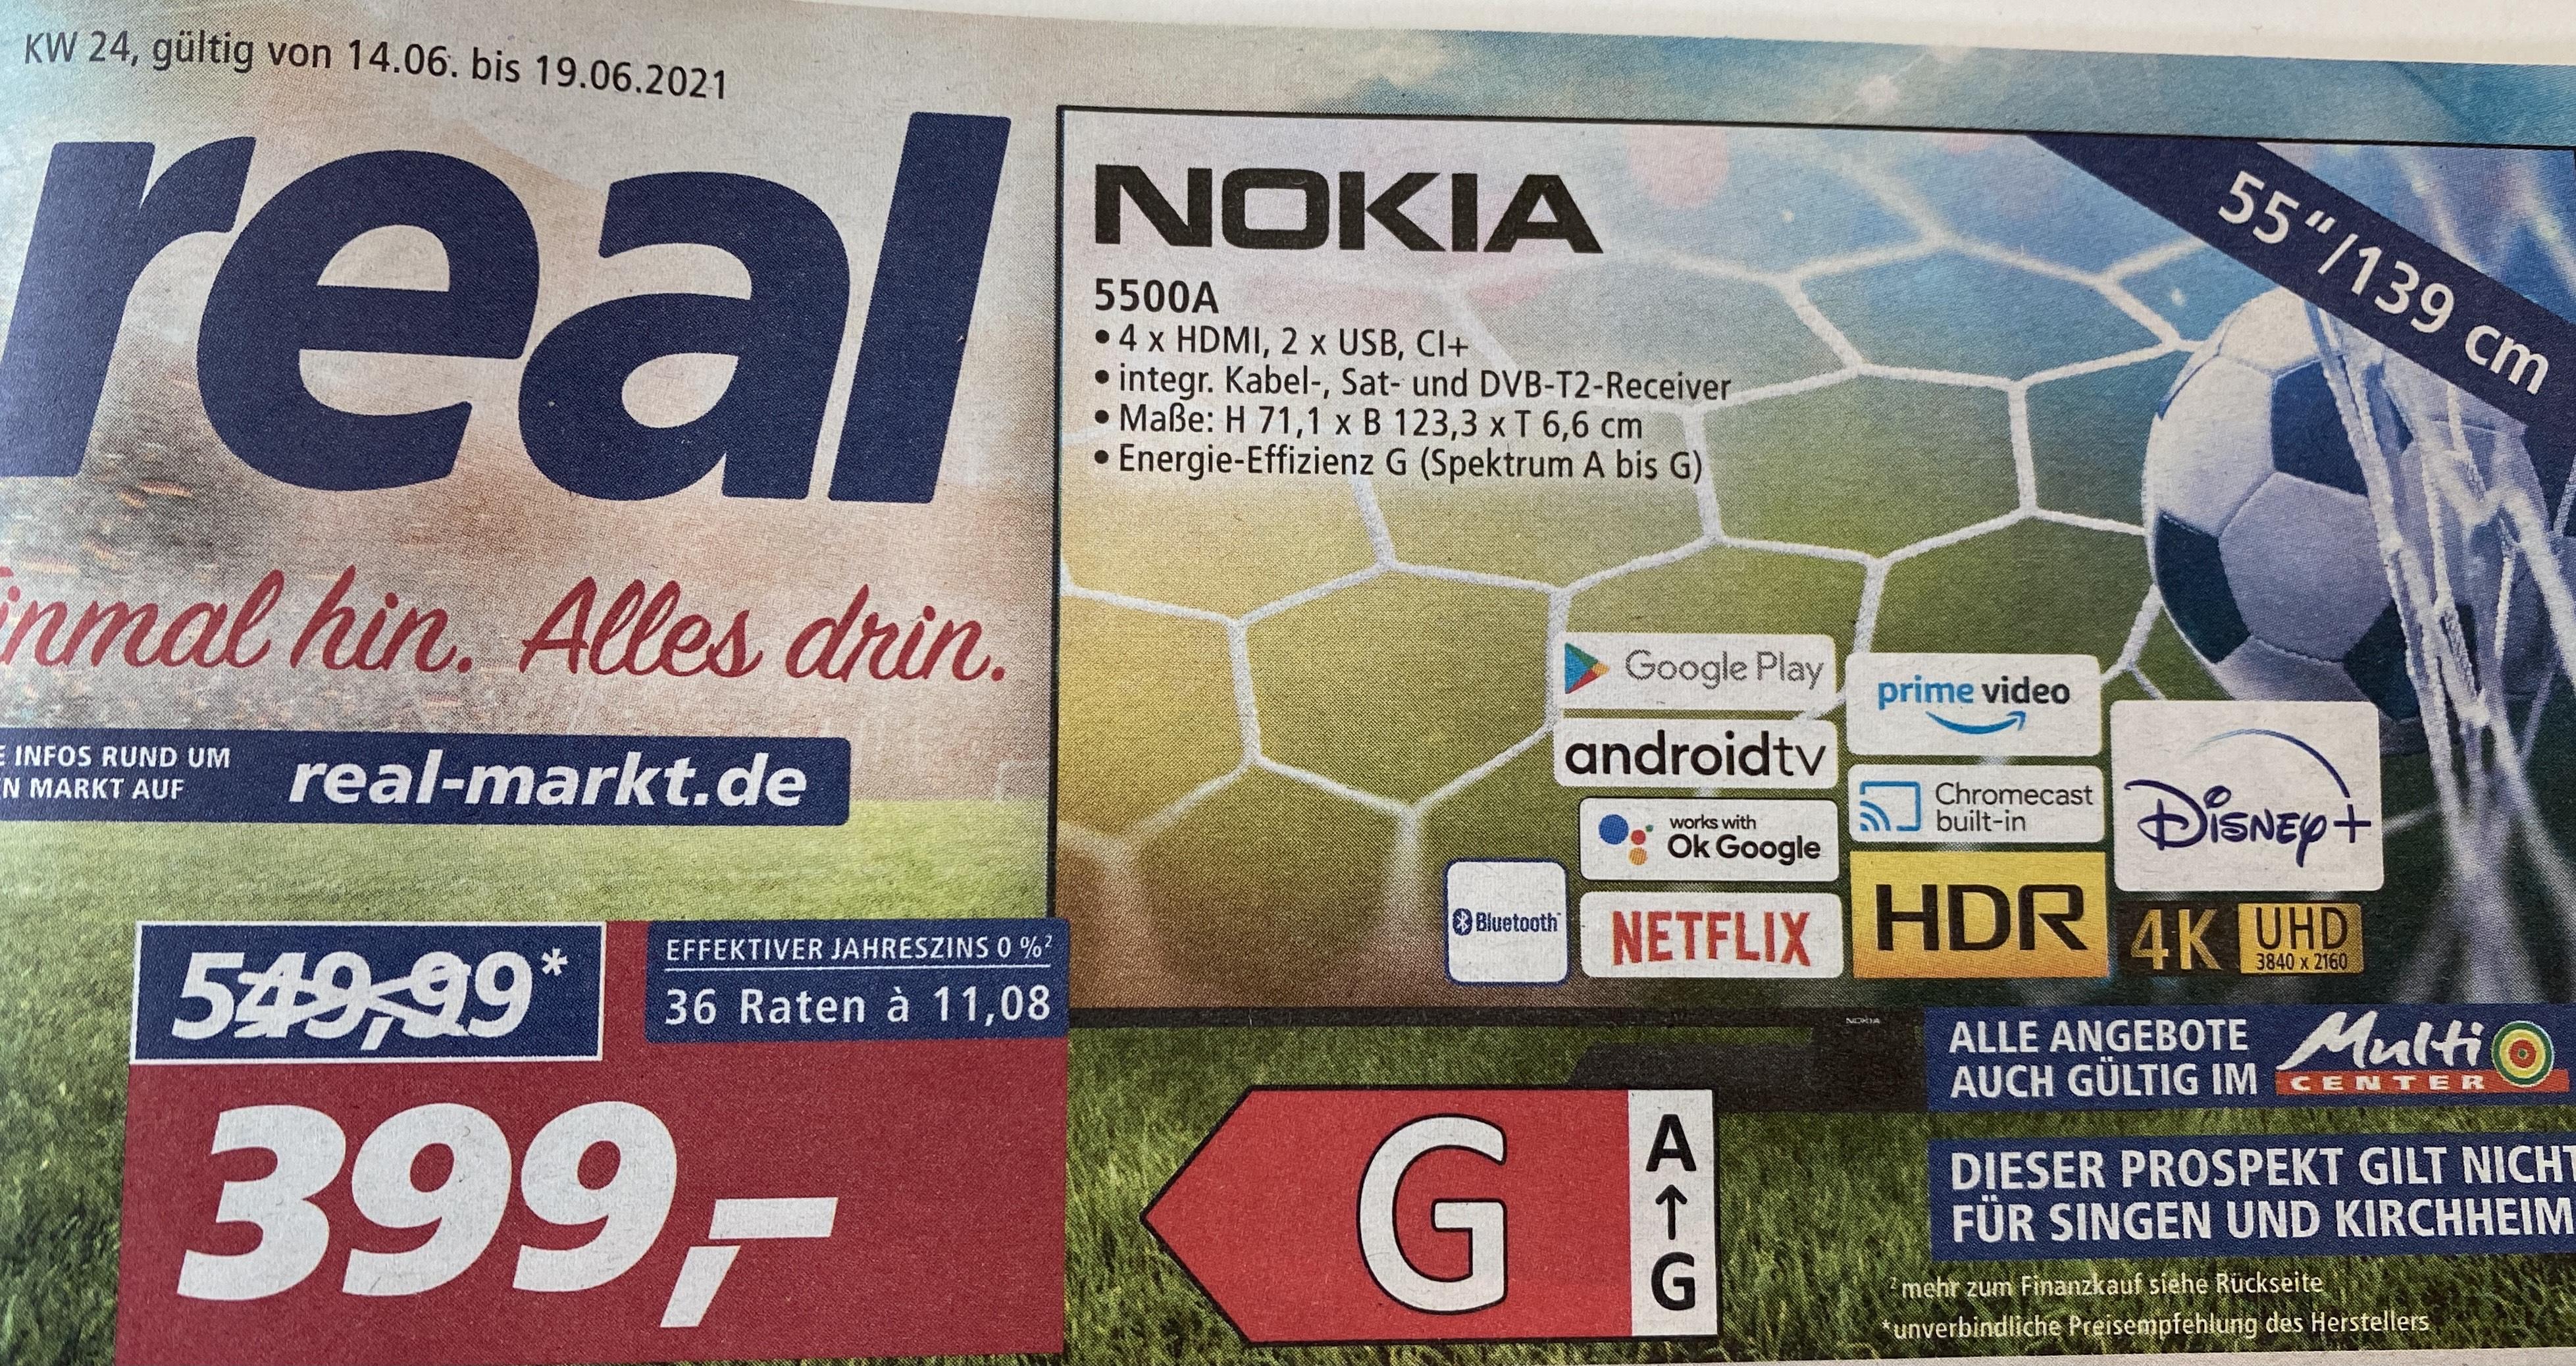 "Nokia TV/Fernseher 55"" 5500A LOKAL REAL"